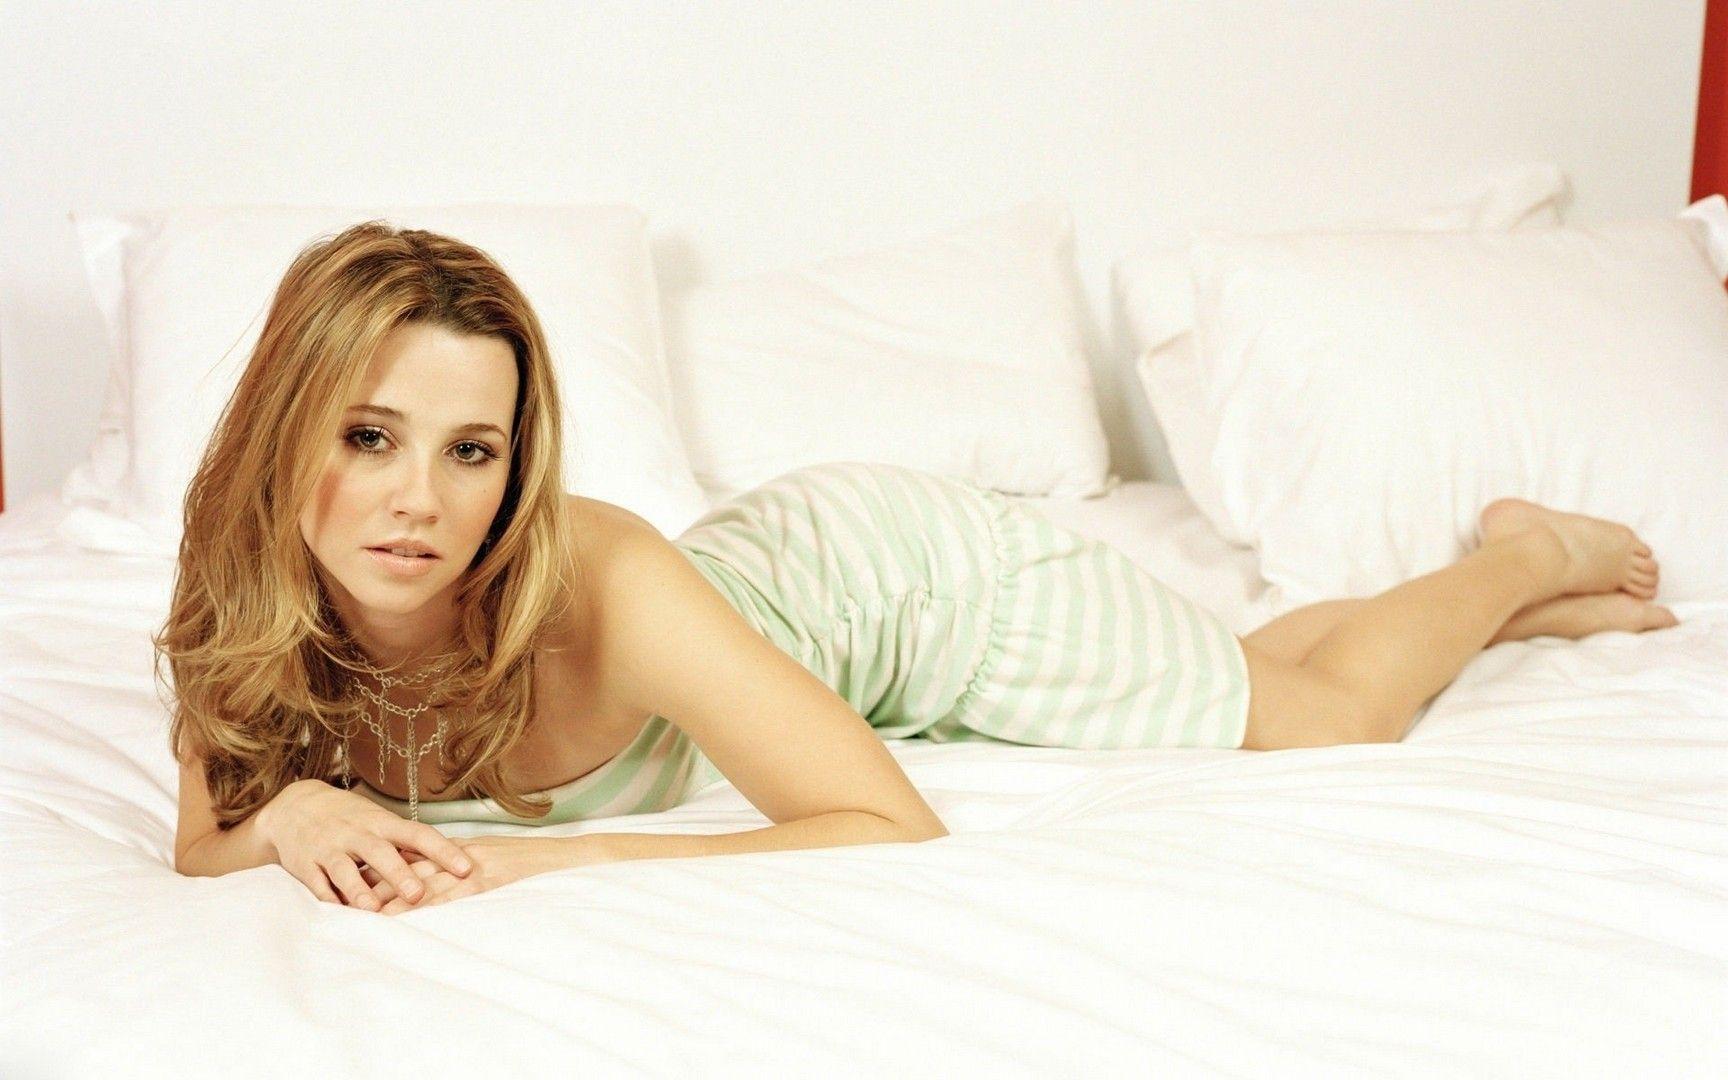 Italian Hotties Best linda edna kardellini is the american actress of the italian-irish